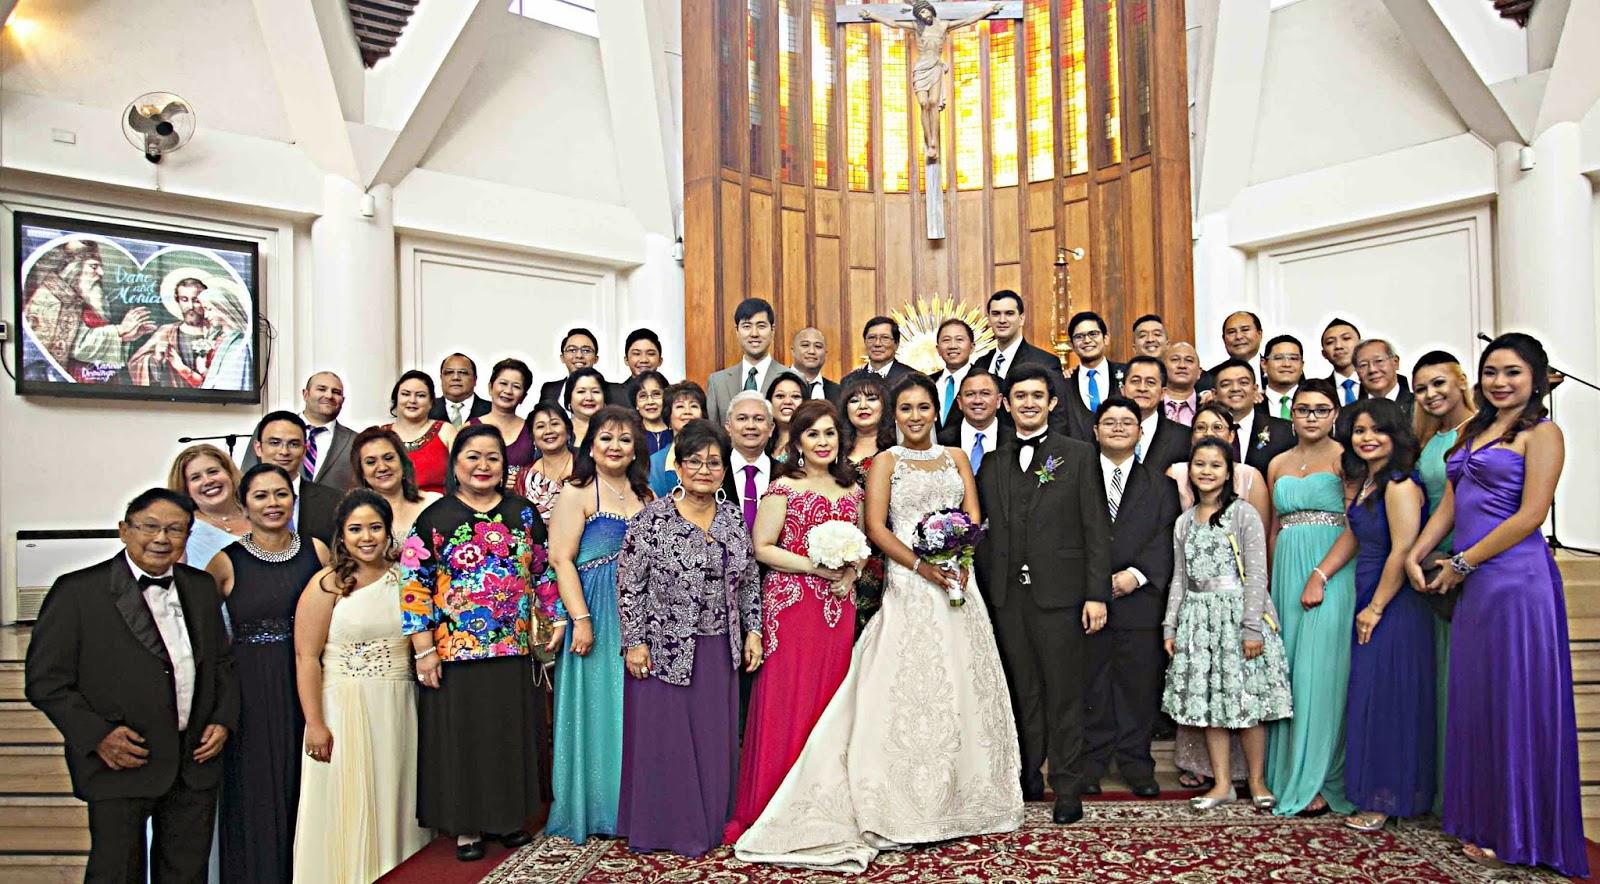 Mancao, Aguilar & Tenazas Clans